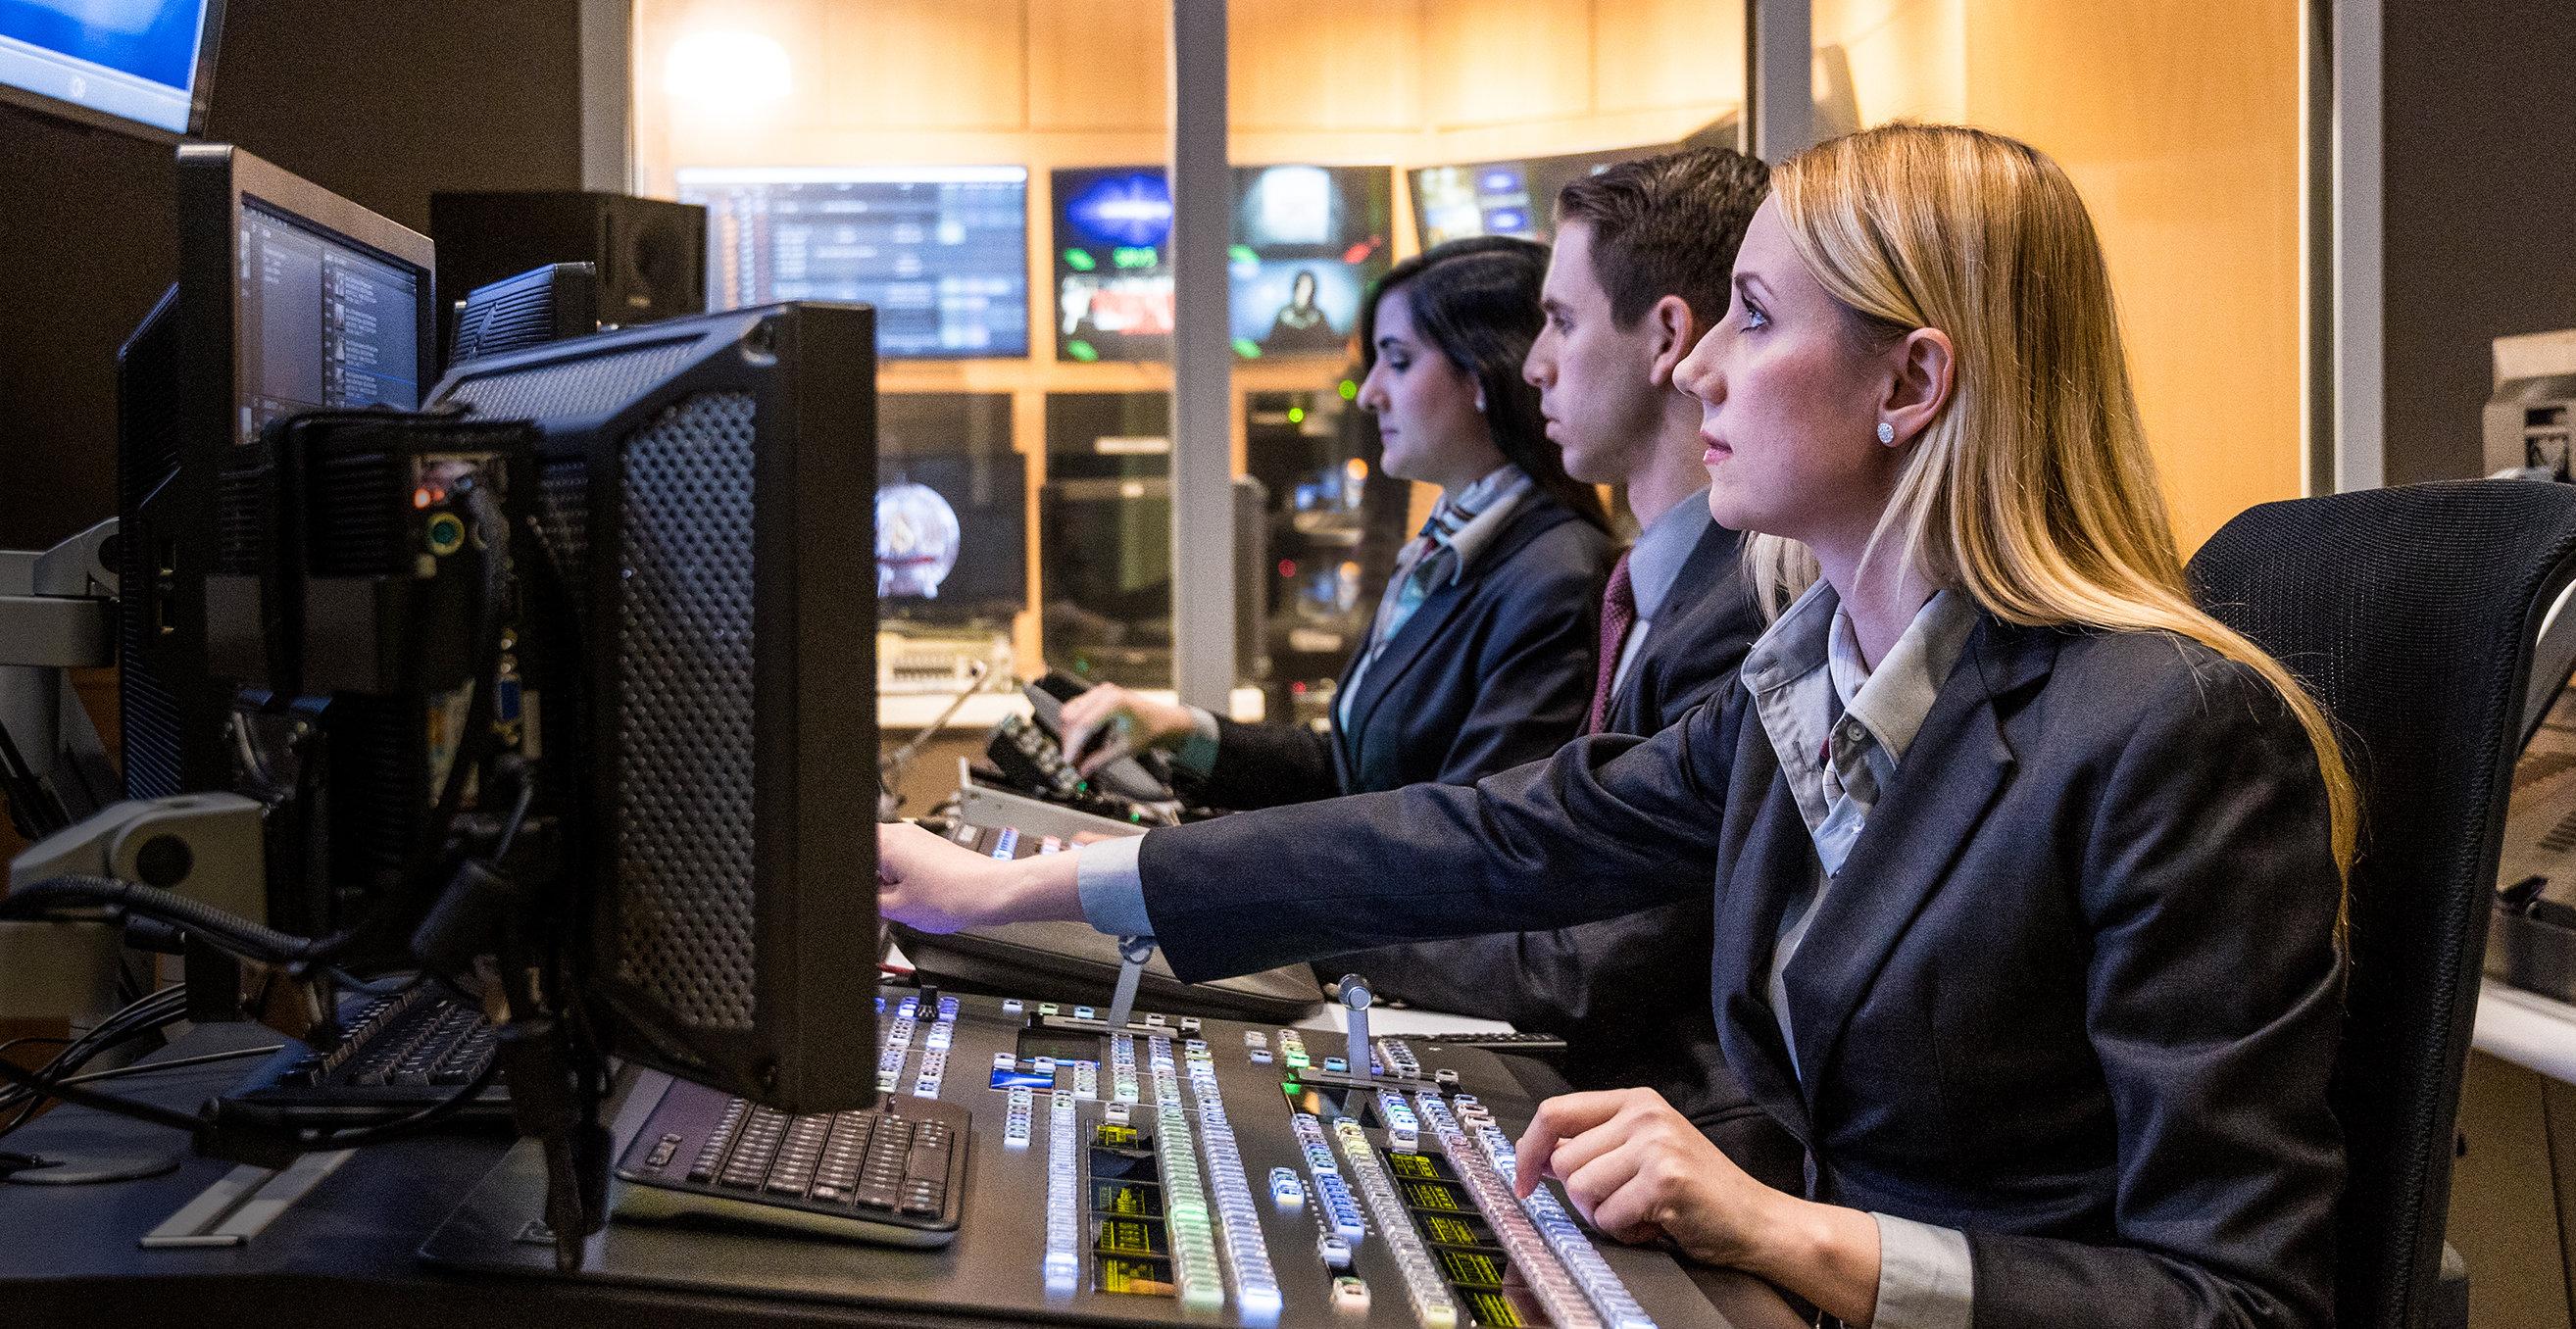 Salas de controlo de televisão de Scientology Media Productions